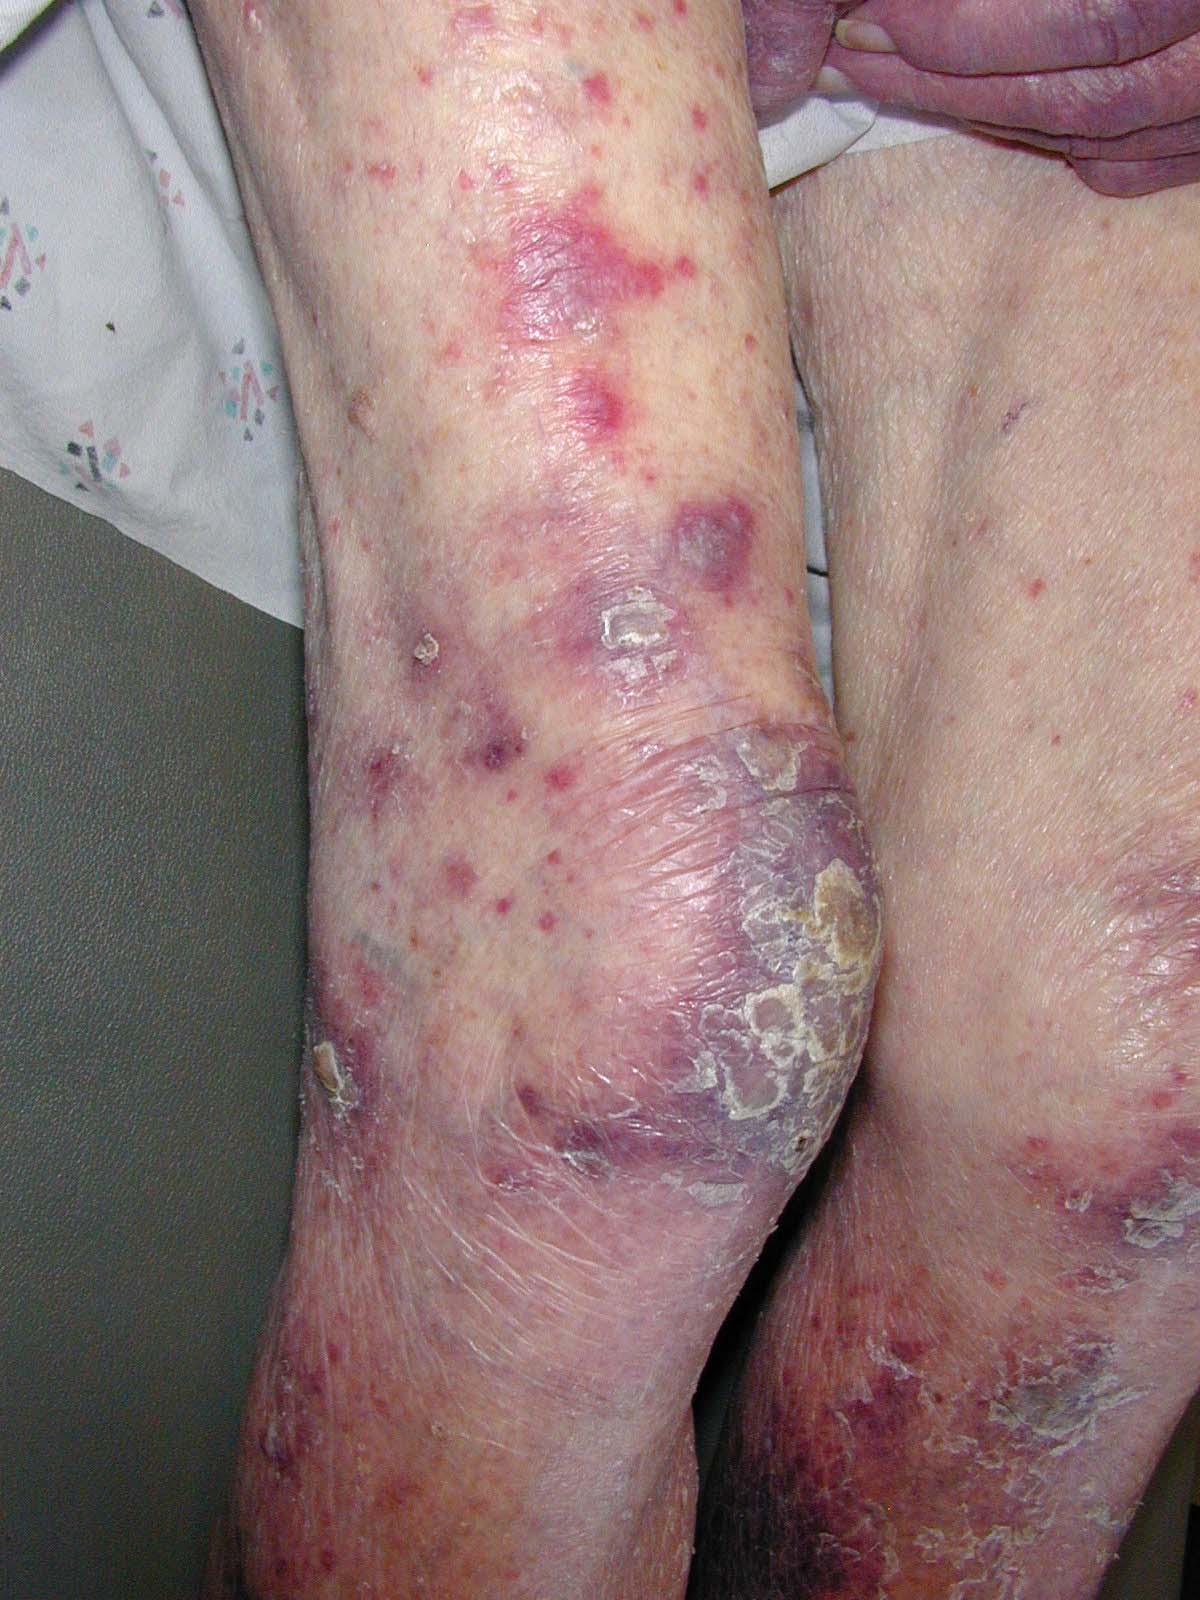 leukemia symtoms in adults jpg 1500x1000